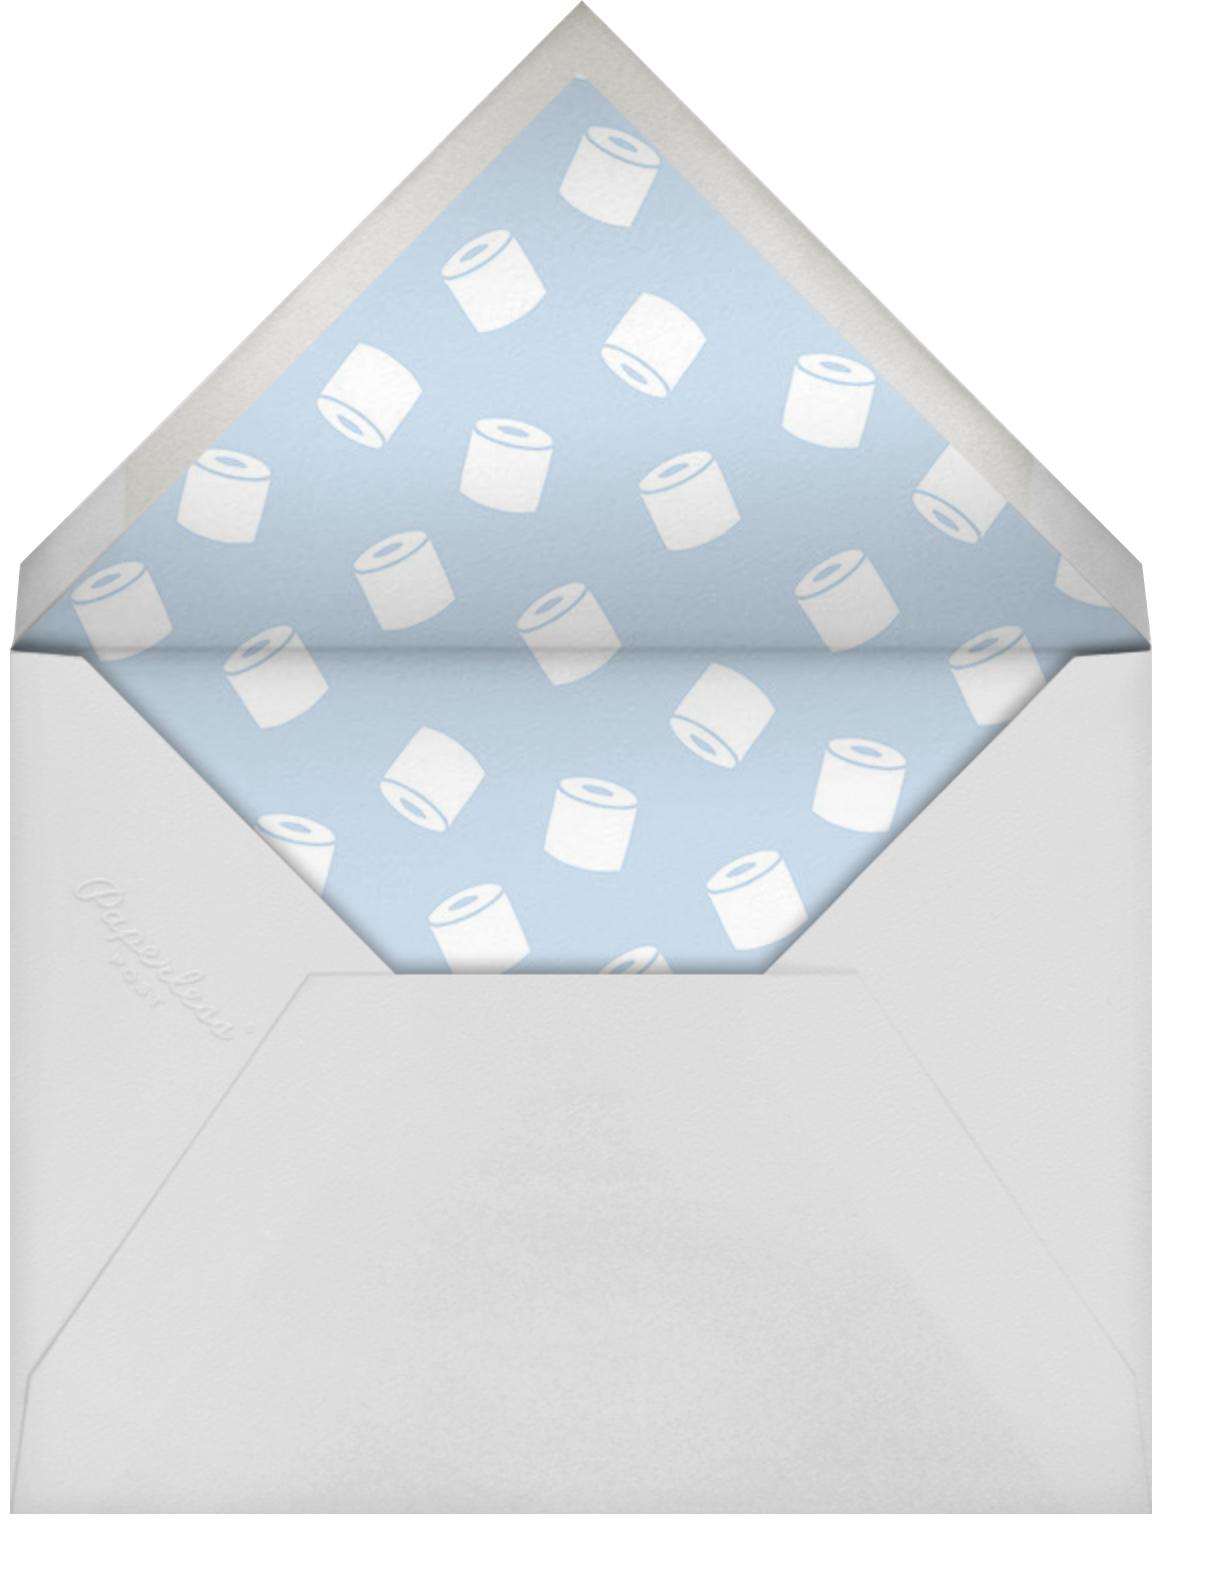 TP Bow - Spring Rain - Cheree Berry - Hanukkah - envelope back